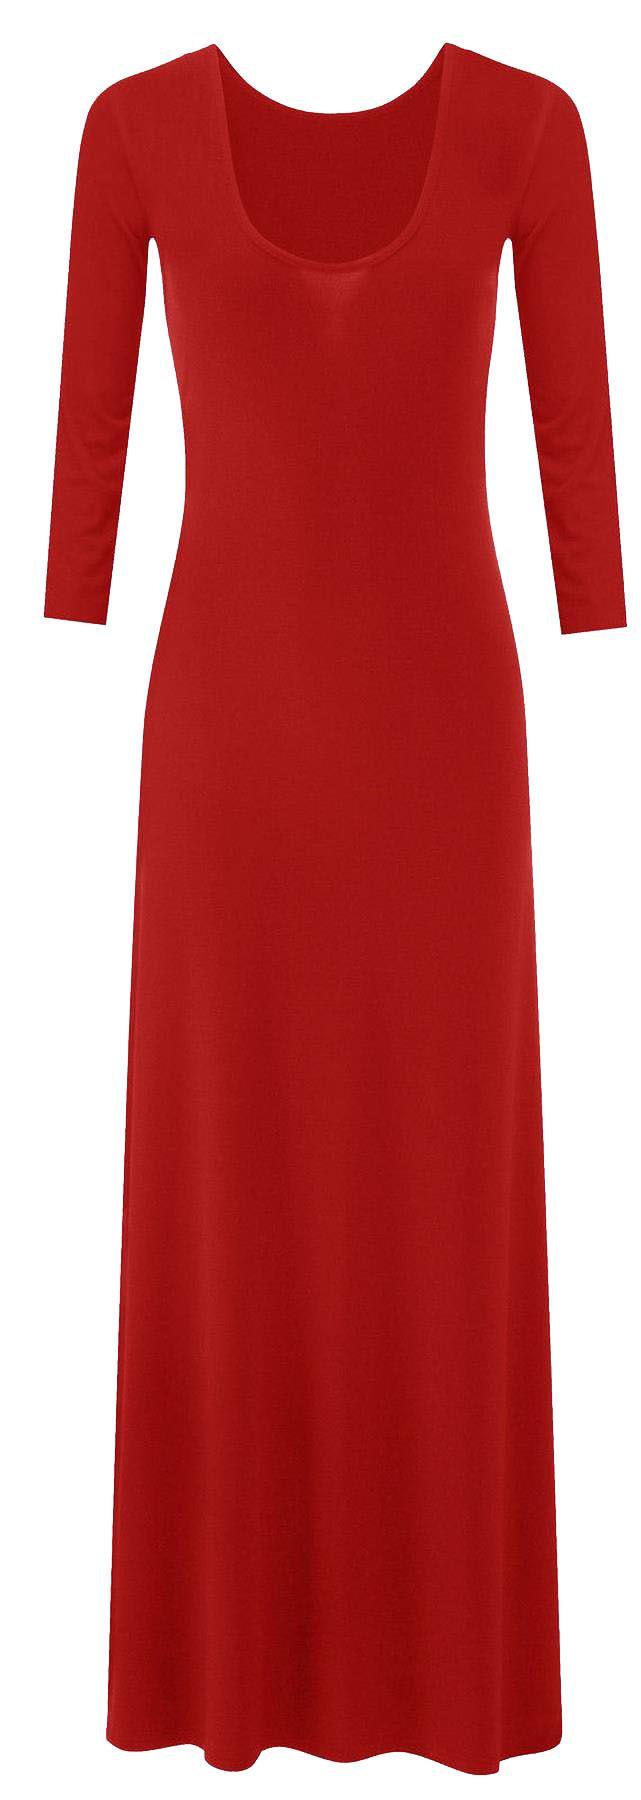 New Ladies Plus Size 3/4 Sleeve Flared Long Maxi Dress 8-26